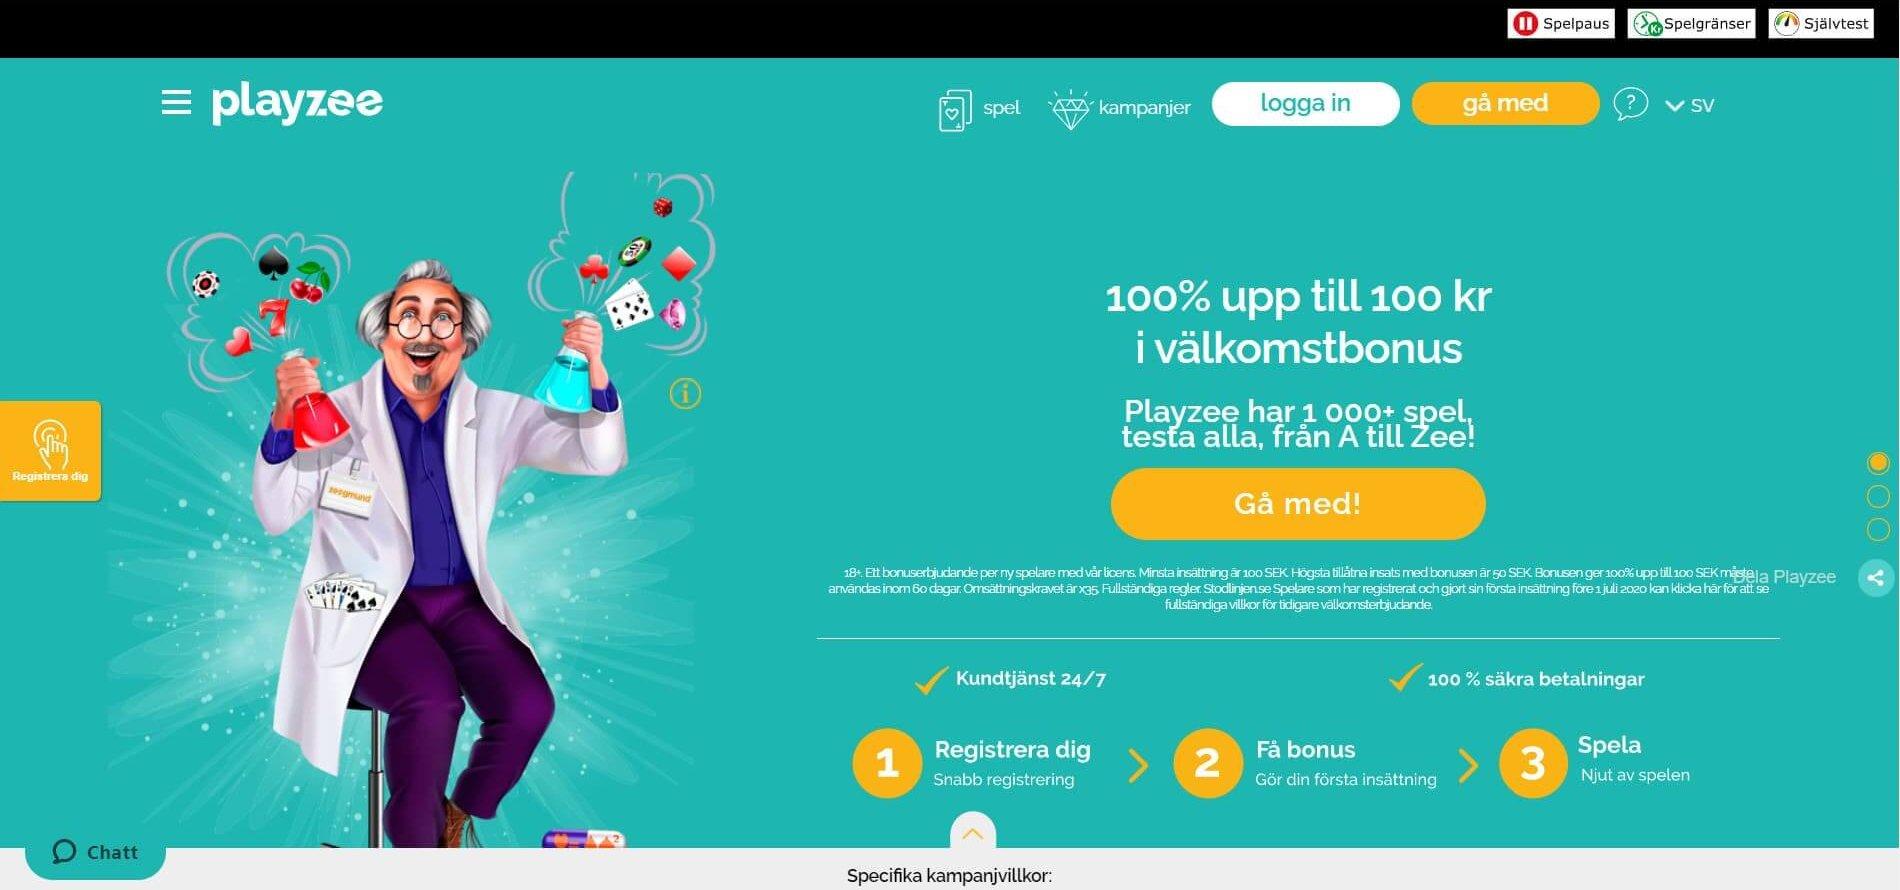 Playzee erbjuder ett unikt online casino!